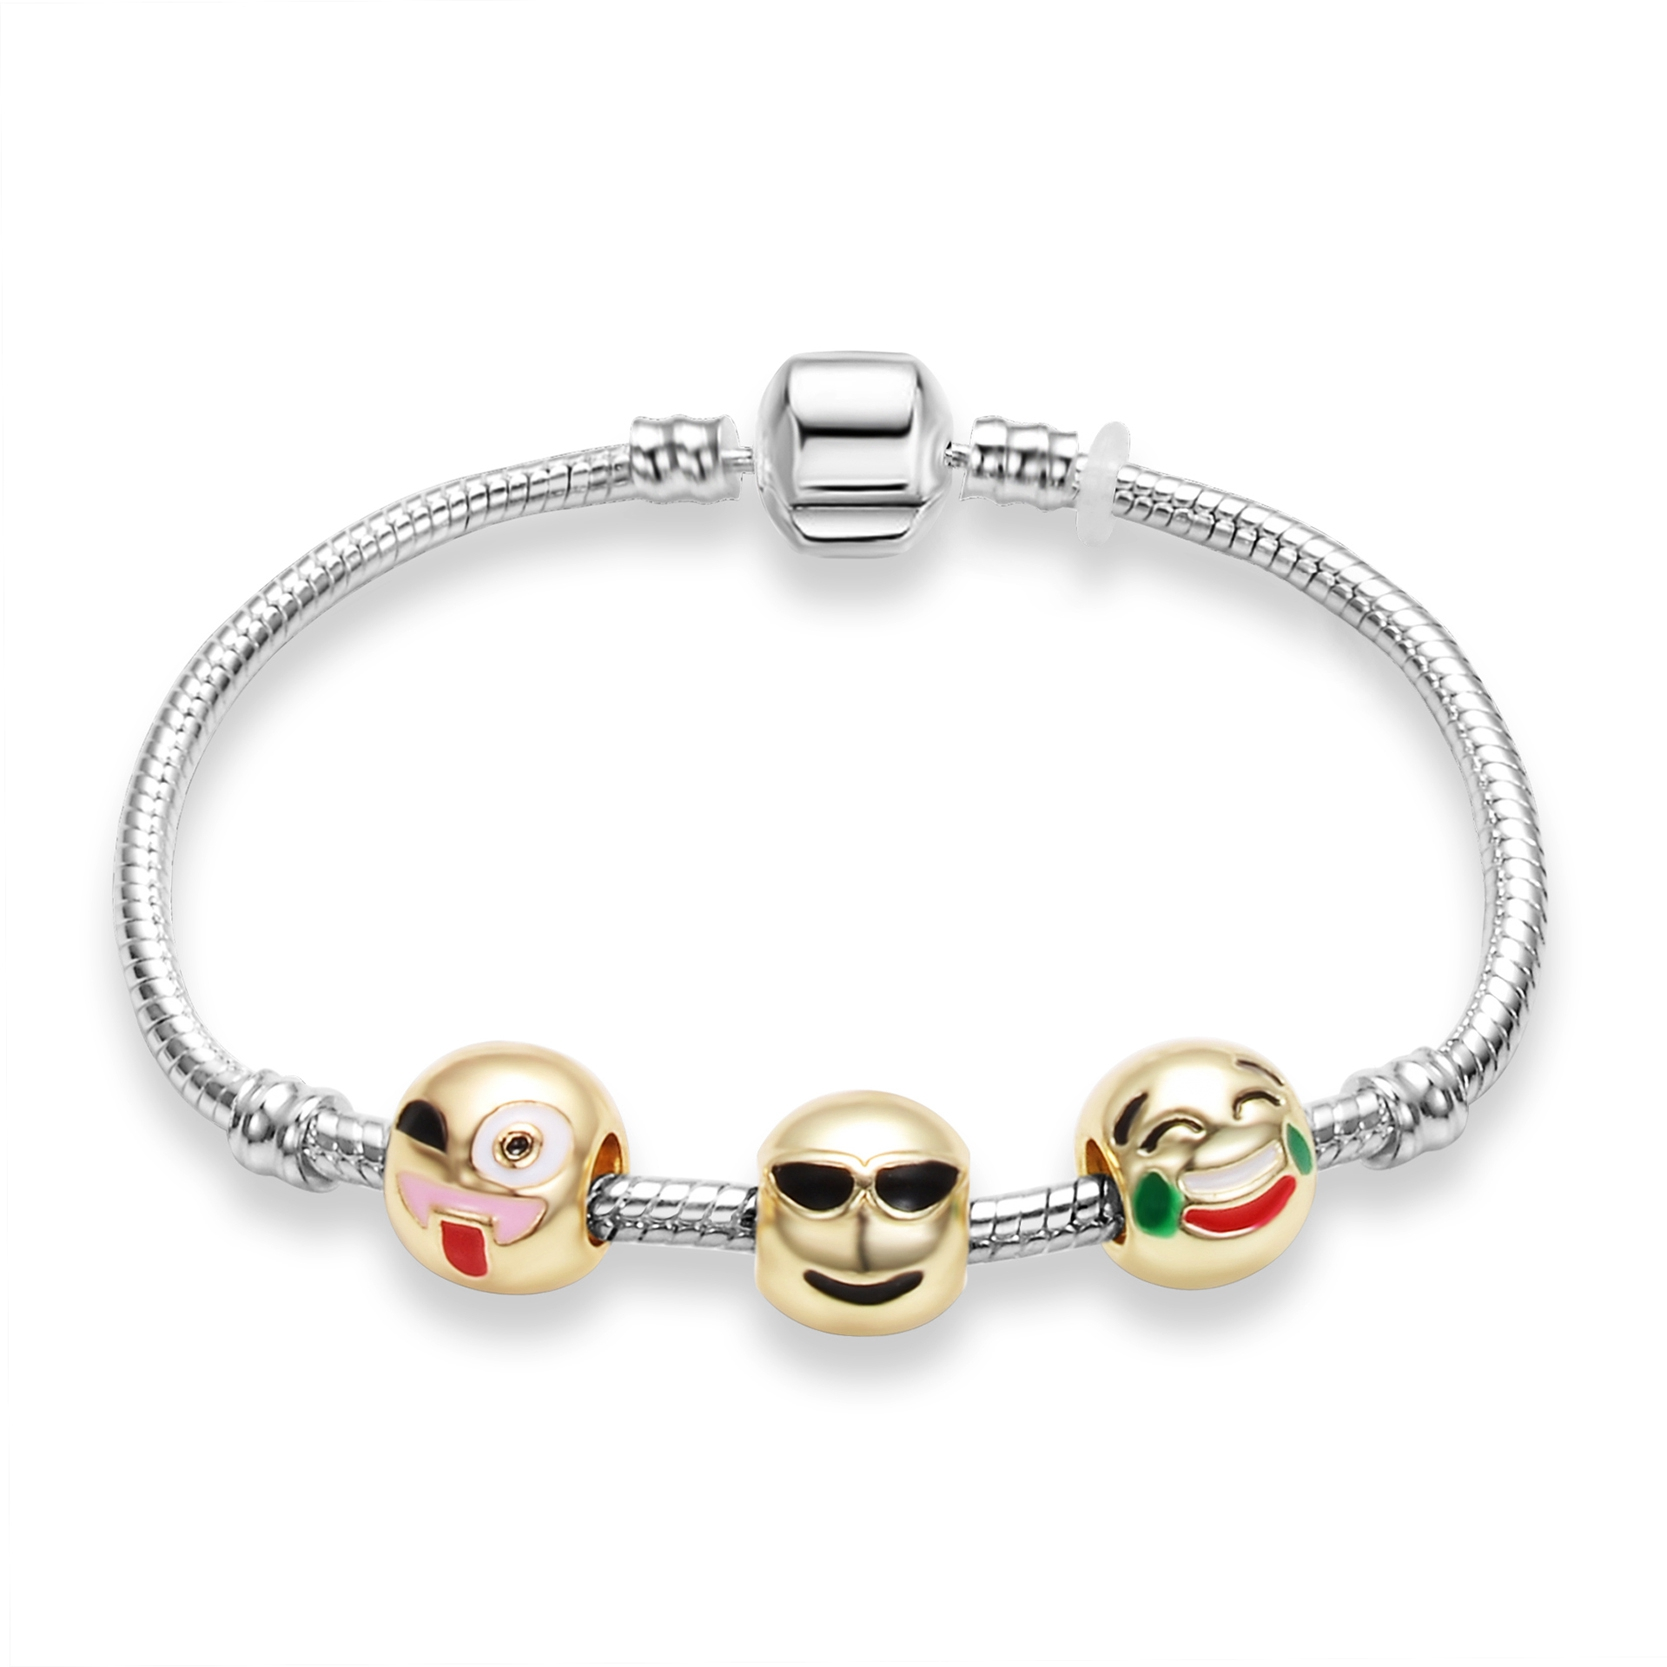 Fashion Sterling Silver Jewelry Cool Face Beads Charm Bracelet Emoji Snake  Chain Bracelets For Women Accessoreis